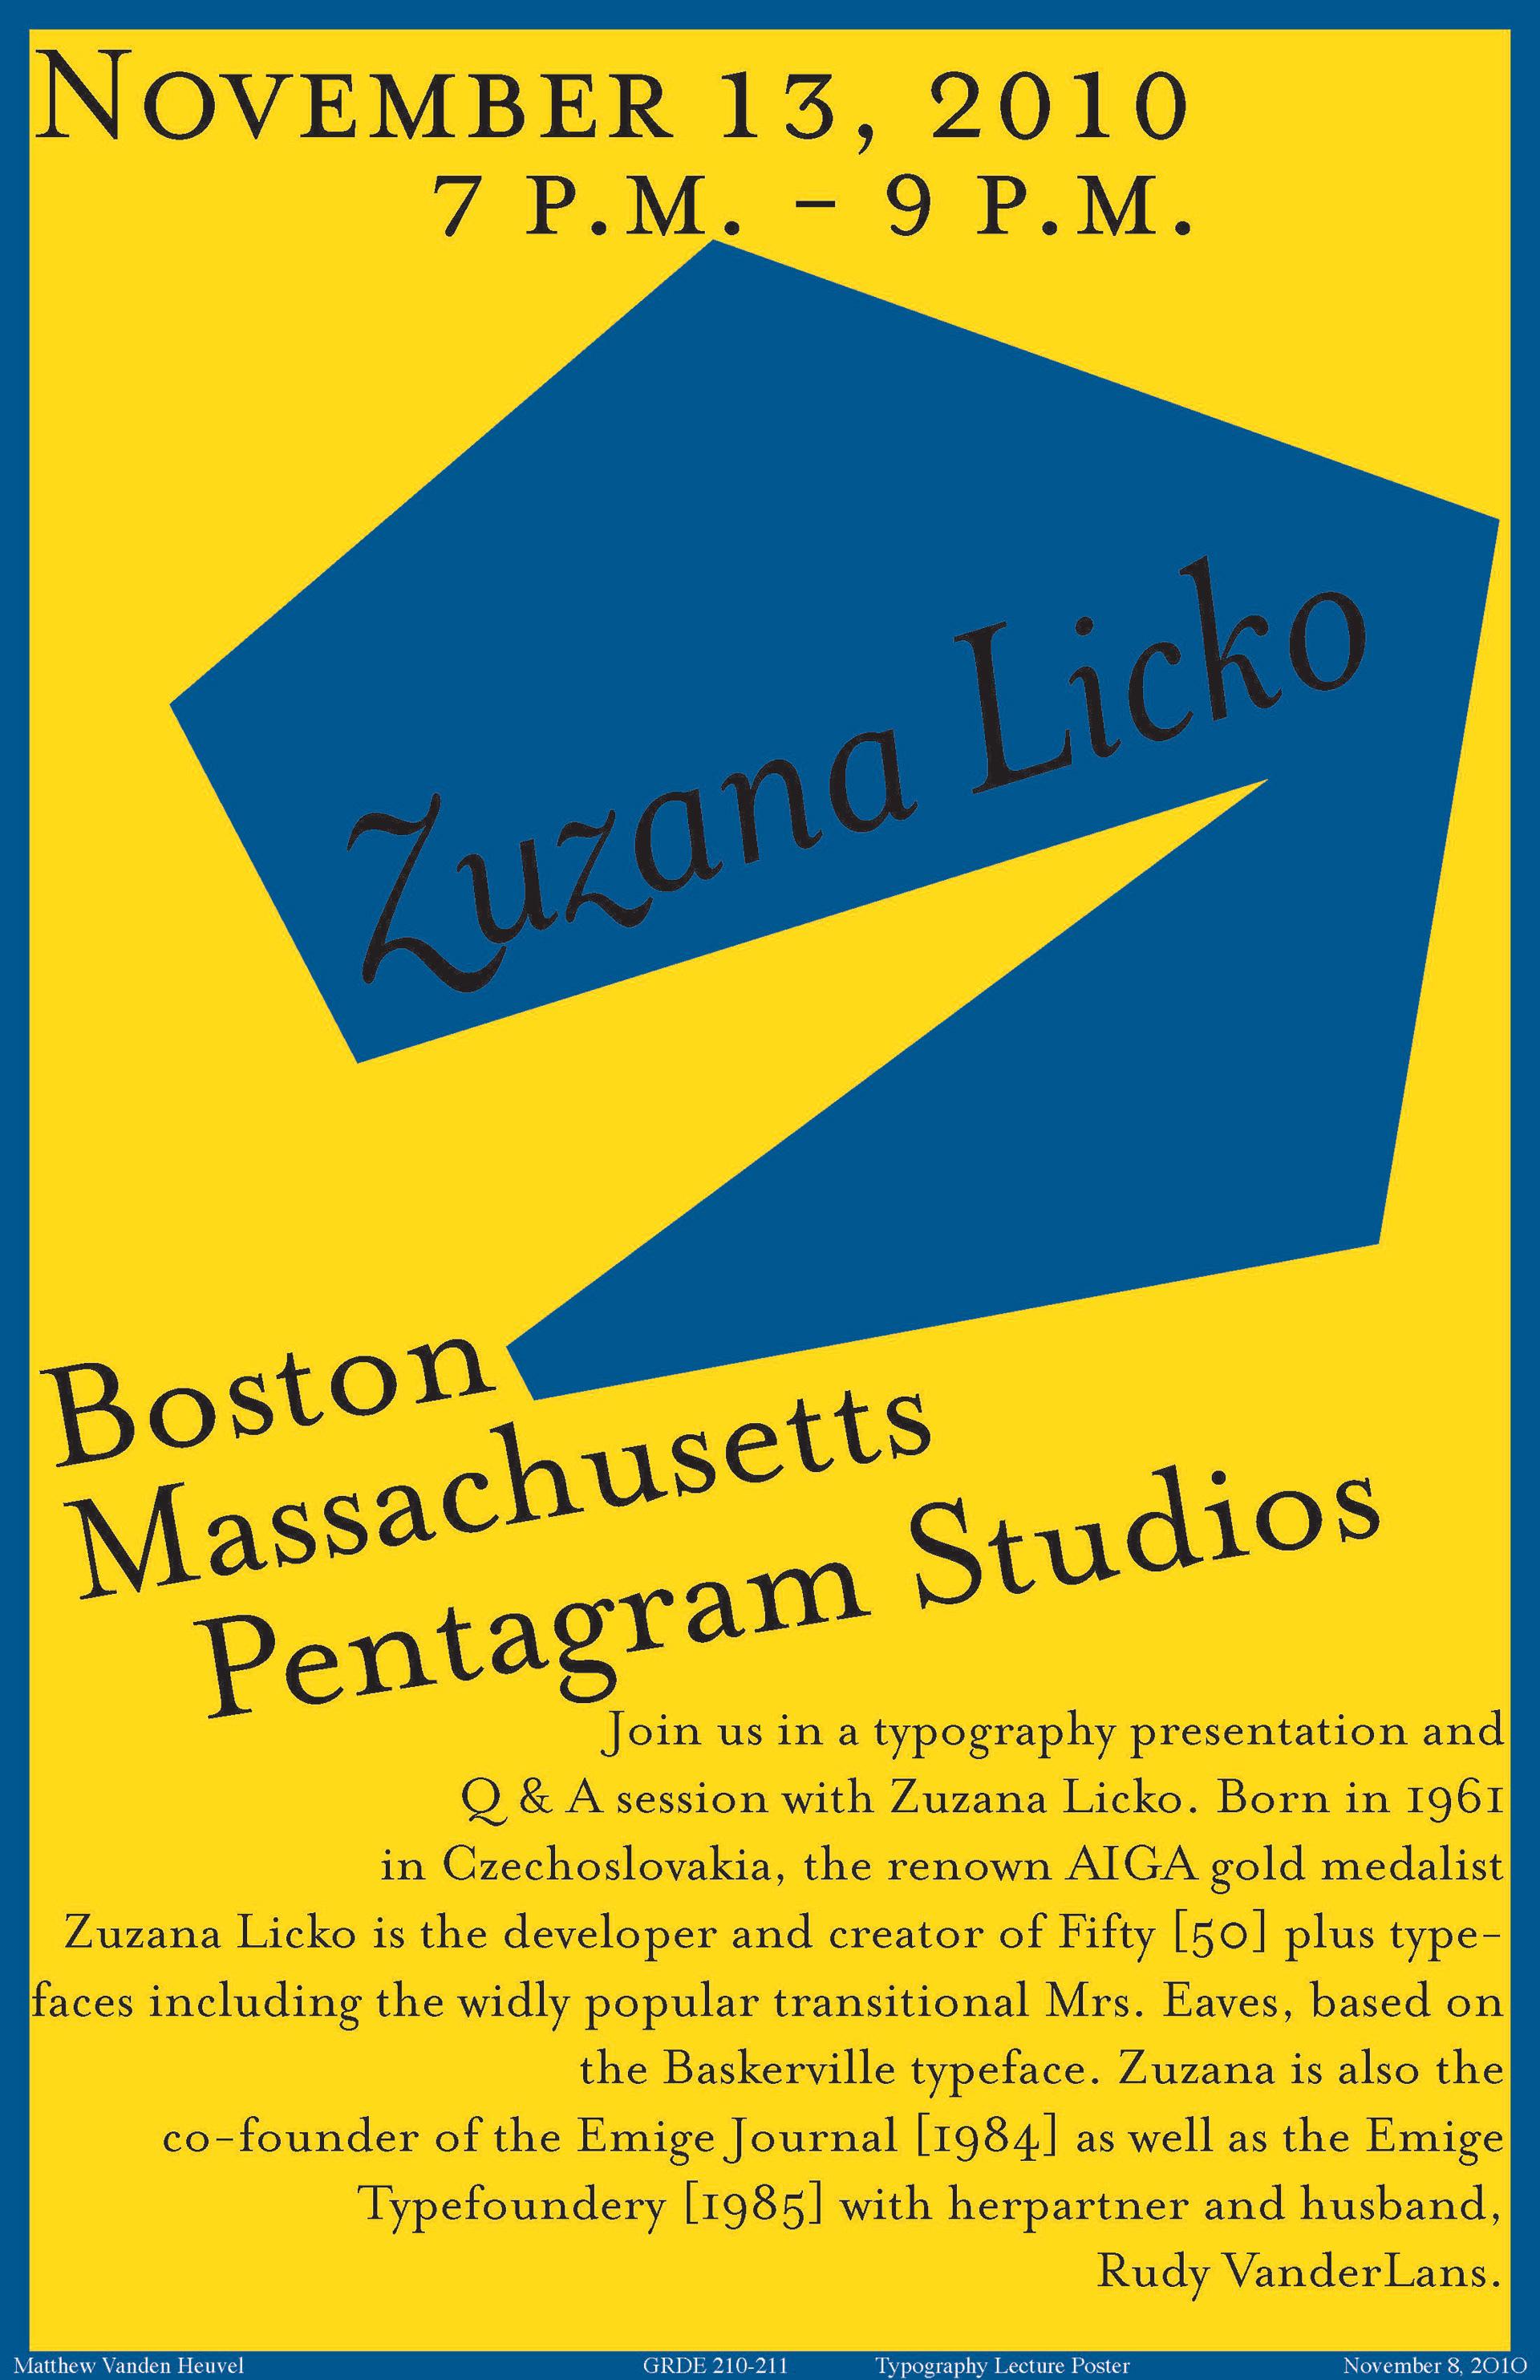 Matt VandenHeuvel - Zuzana Licko Poster